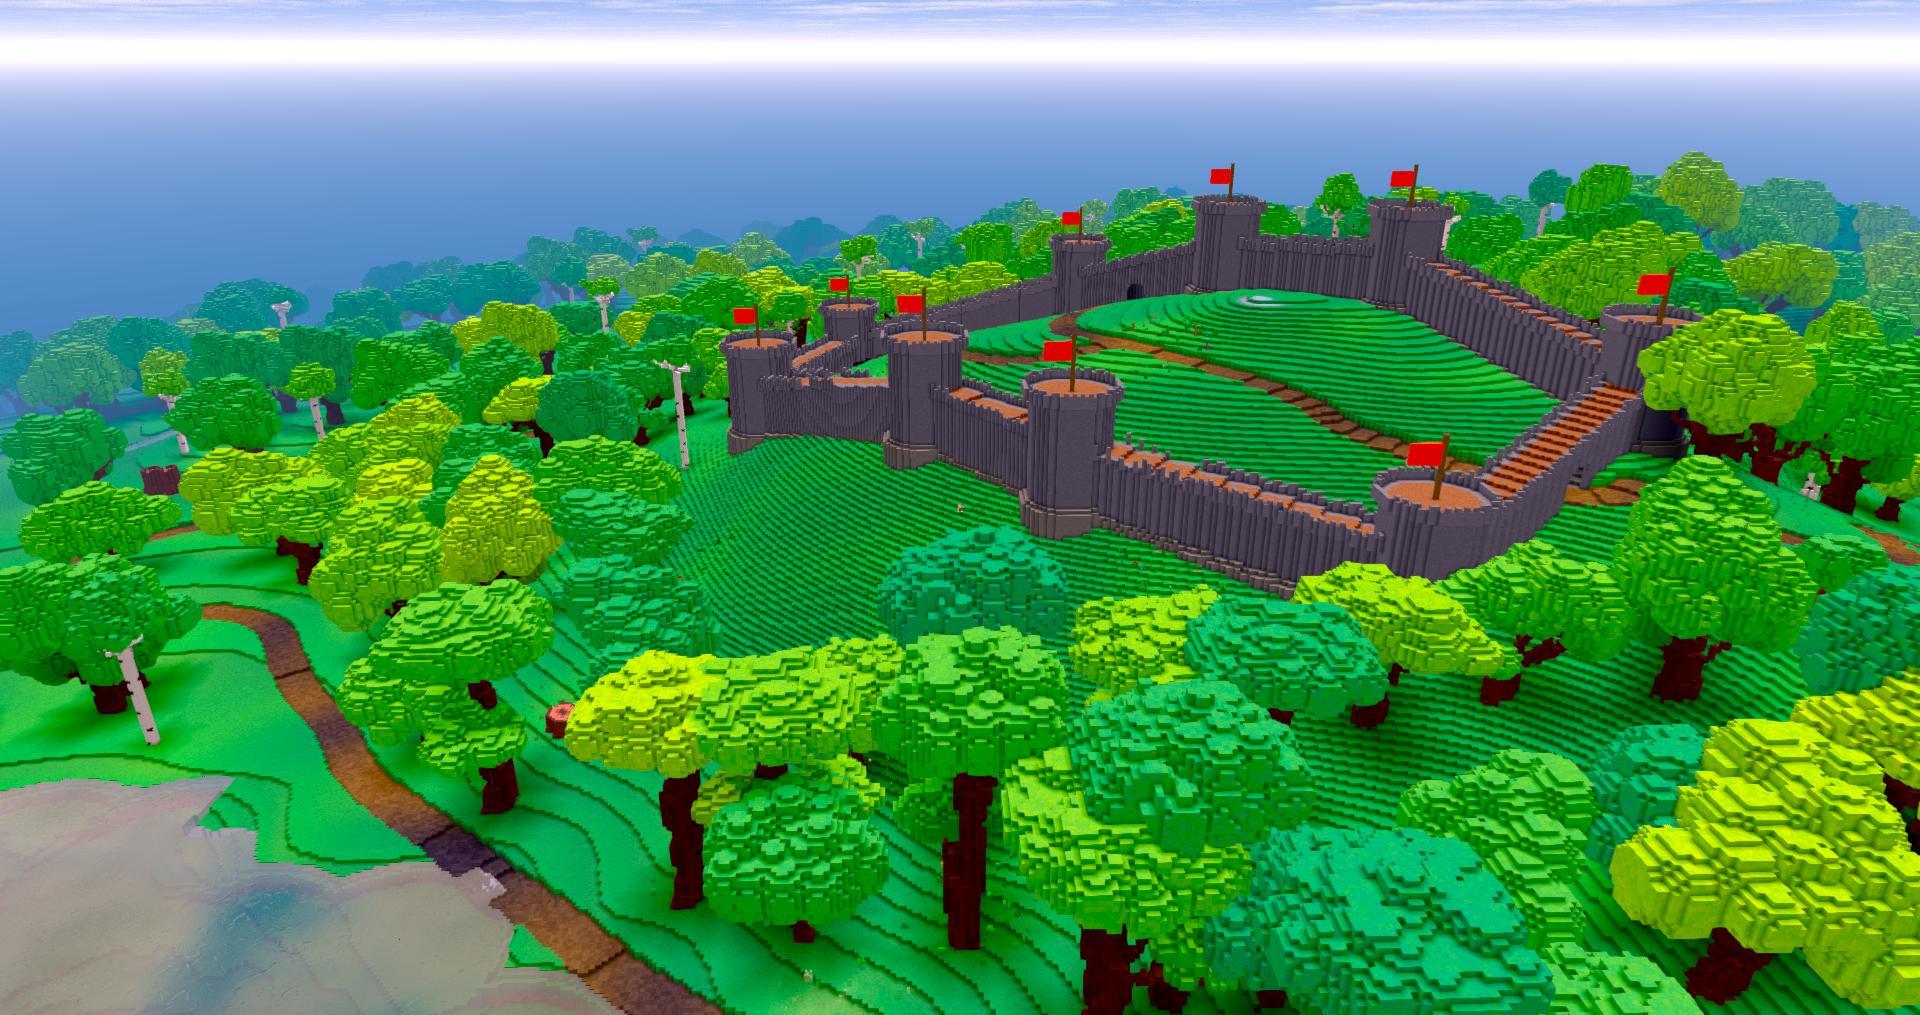 Work on castle generation